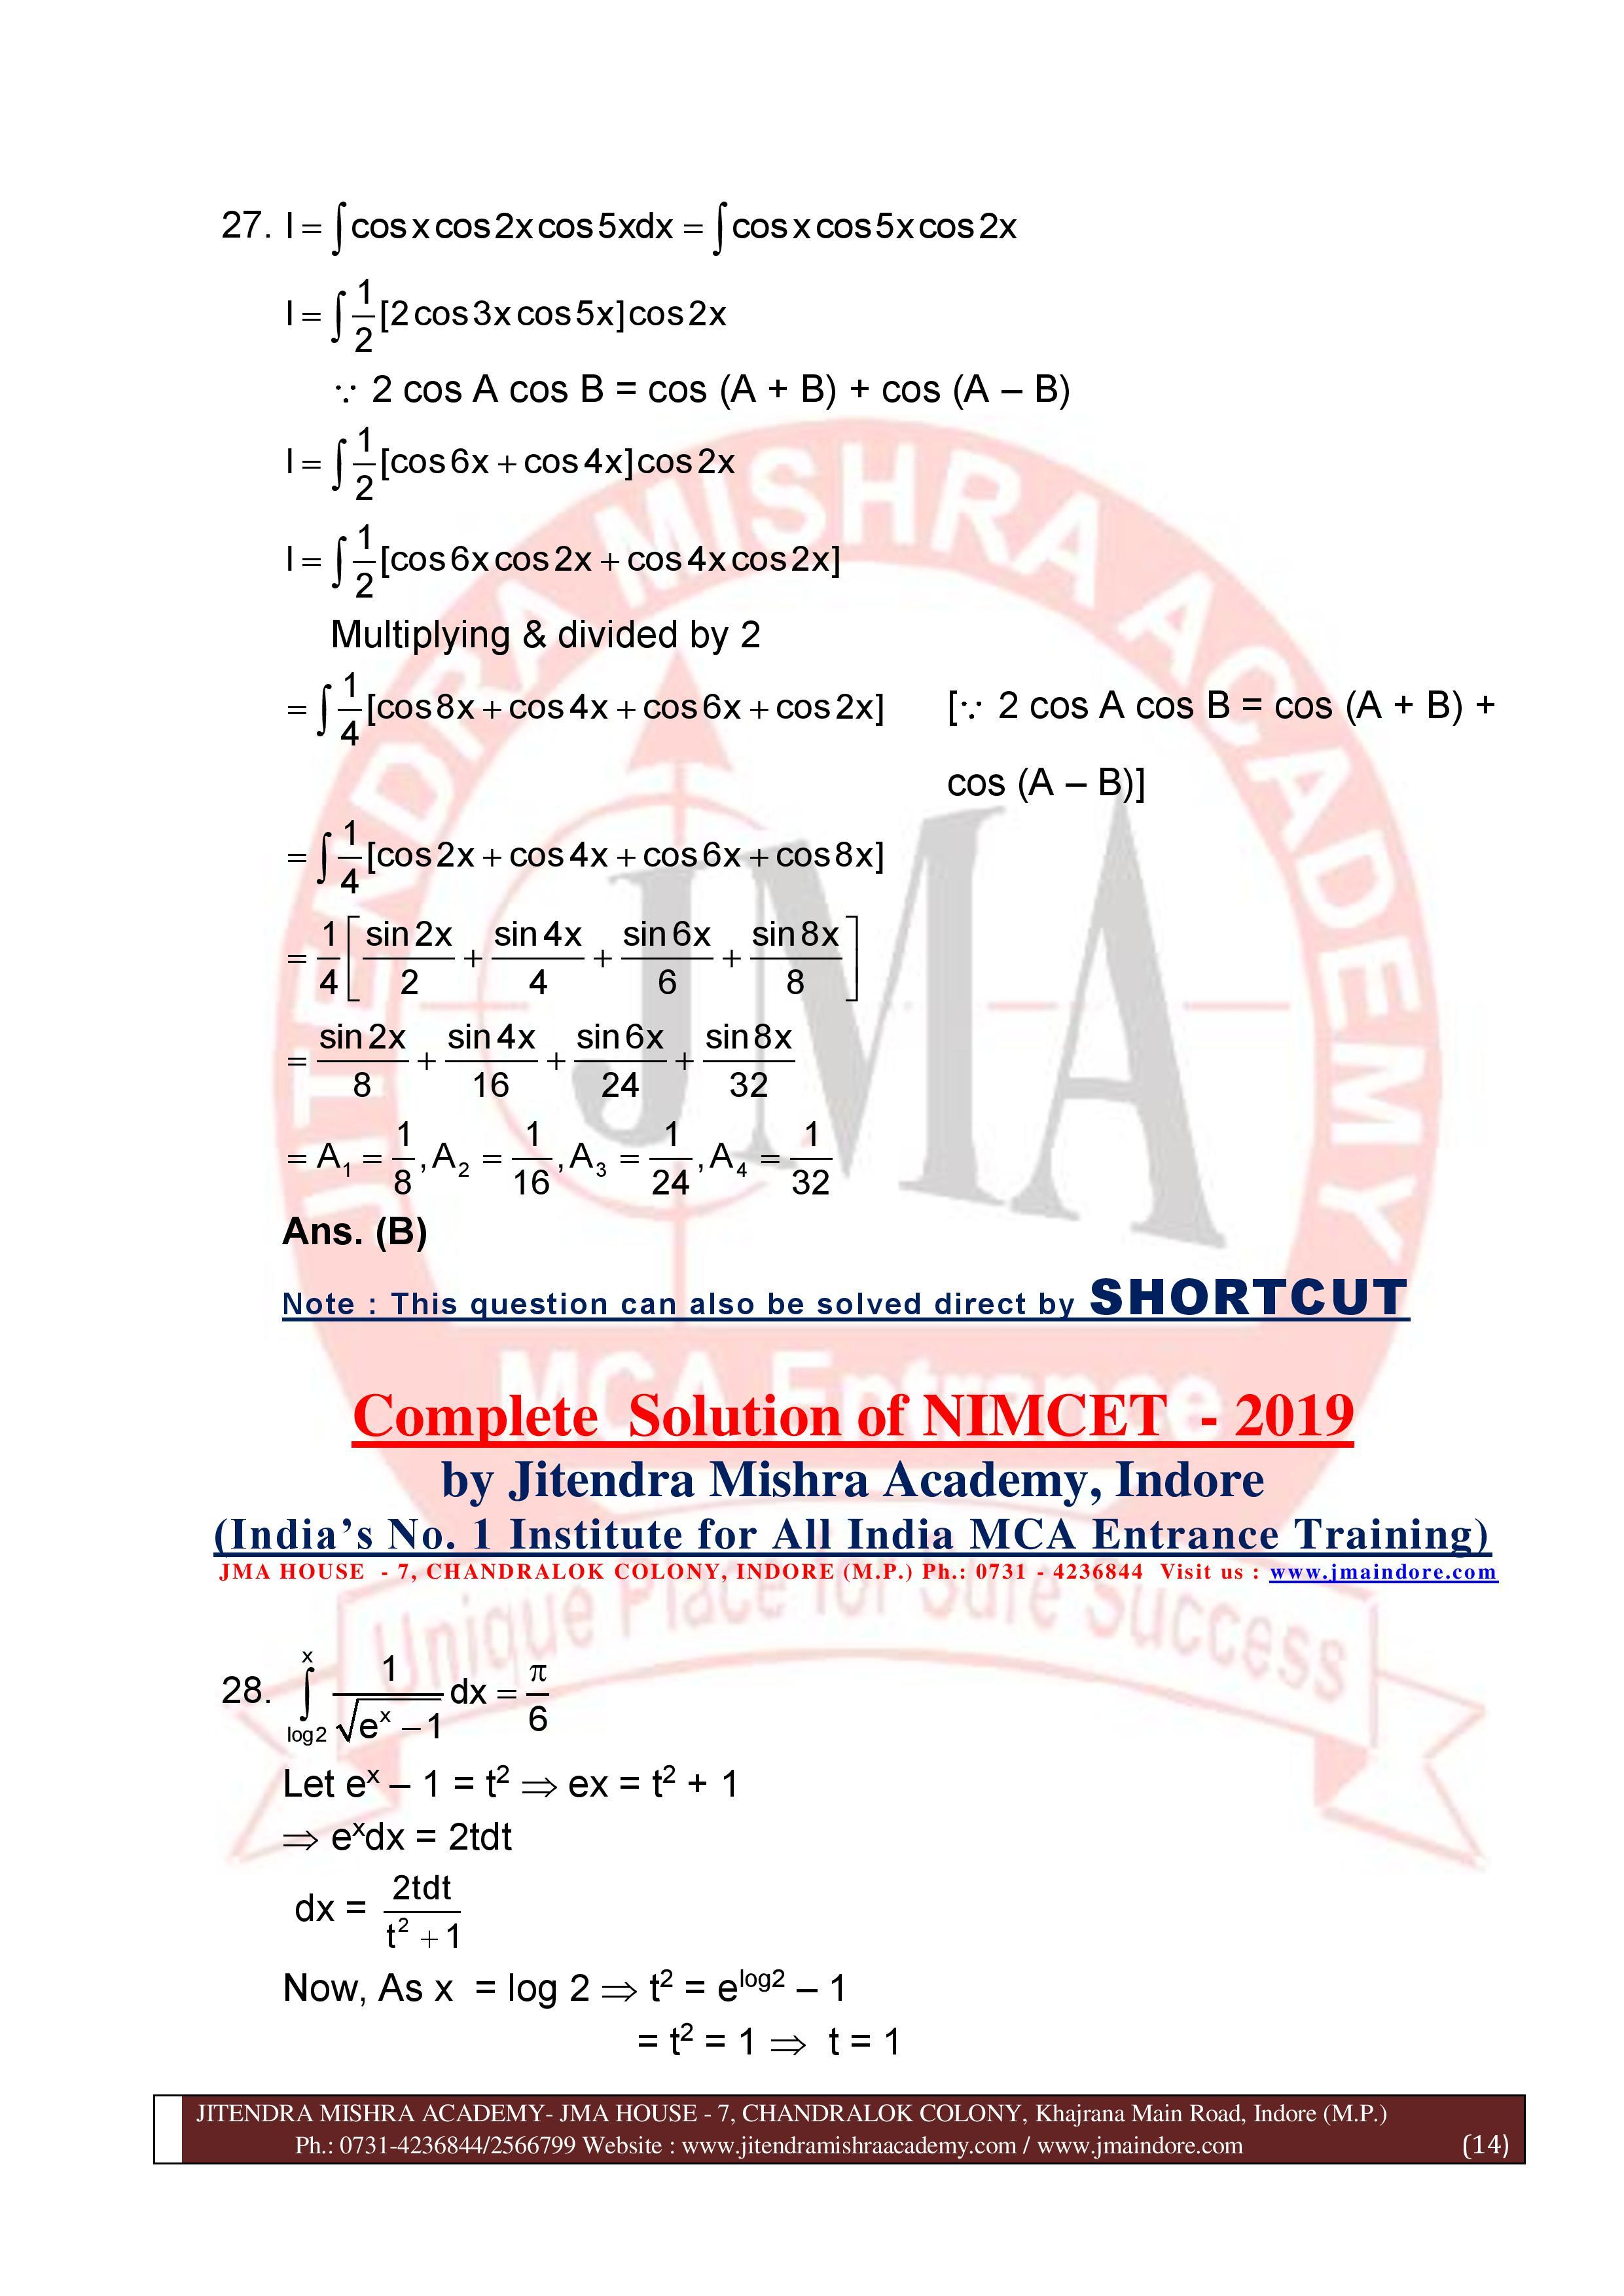 NIMCET 2019 SOLUTION (SET - A)-page-014